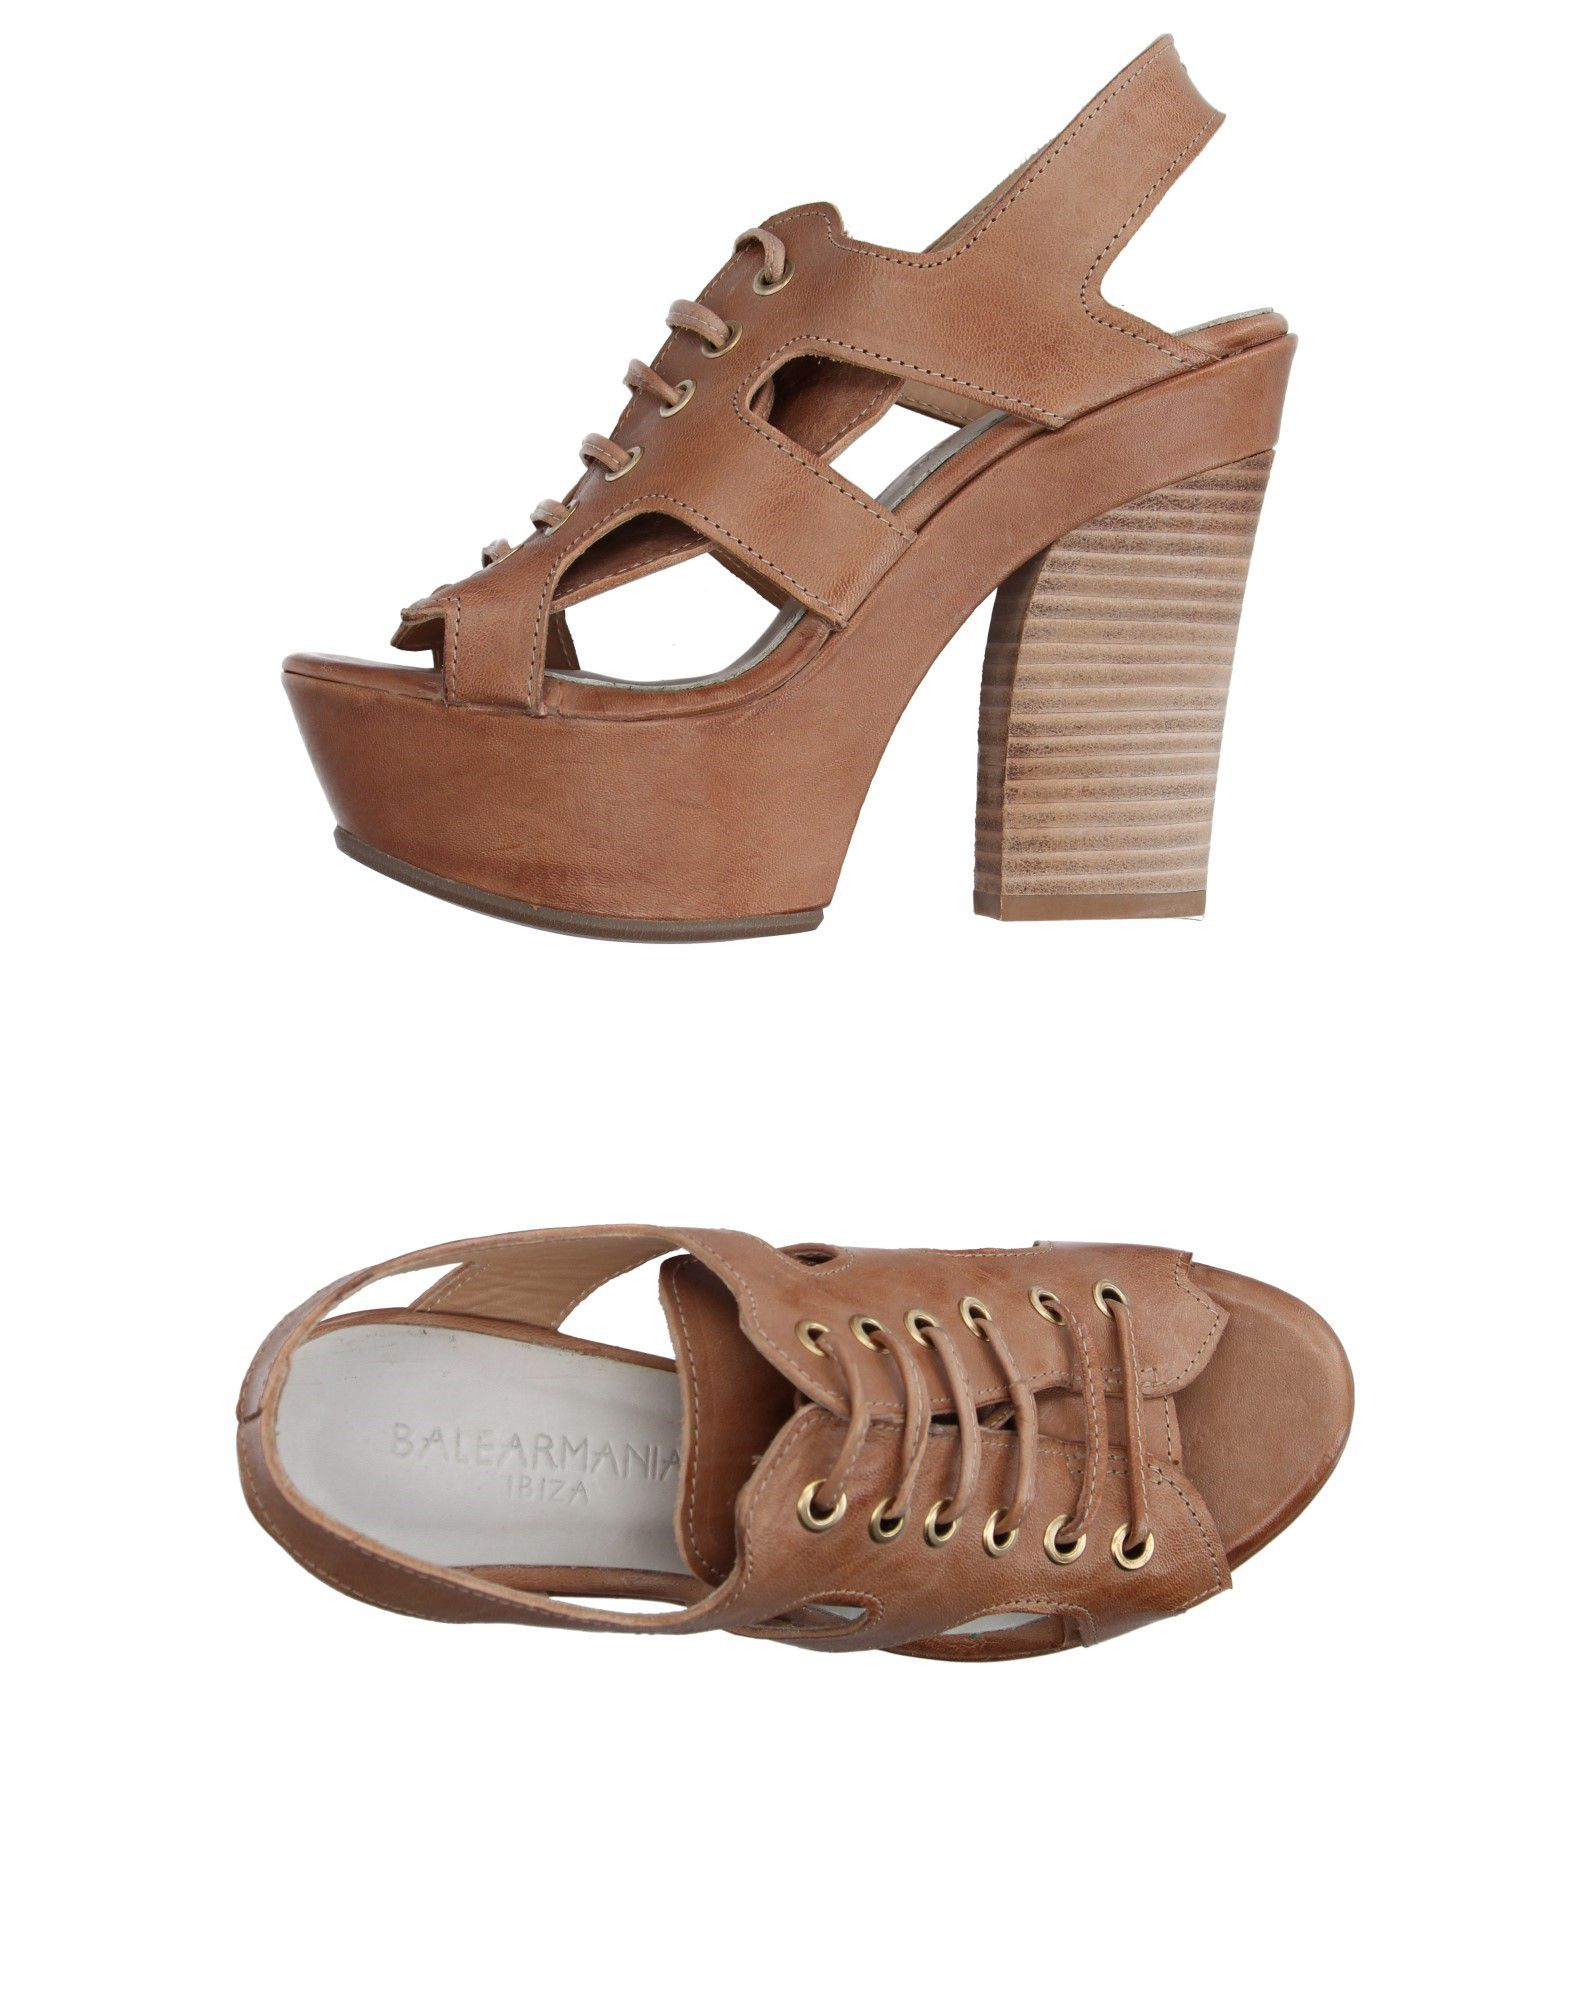 Balear Mania Sandalen strapazierfähige Damen  11141044XQGut aussehende strapazierfähige Sandalen Schuhe 4c5b68